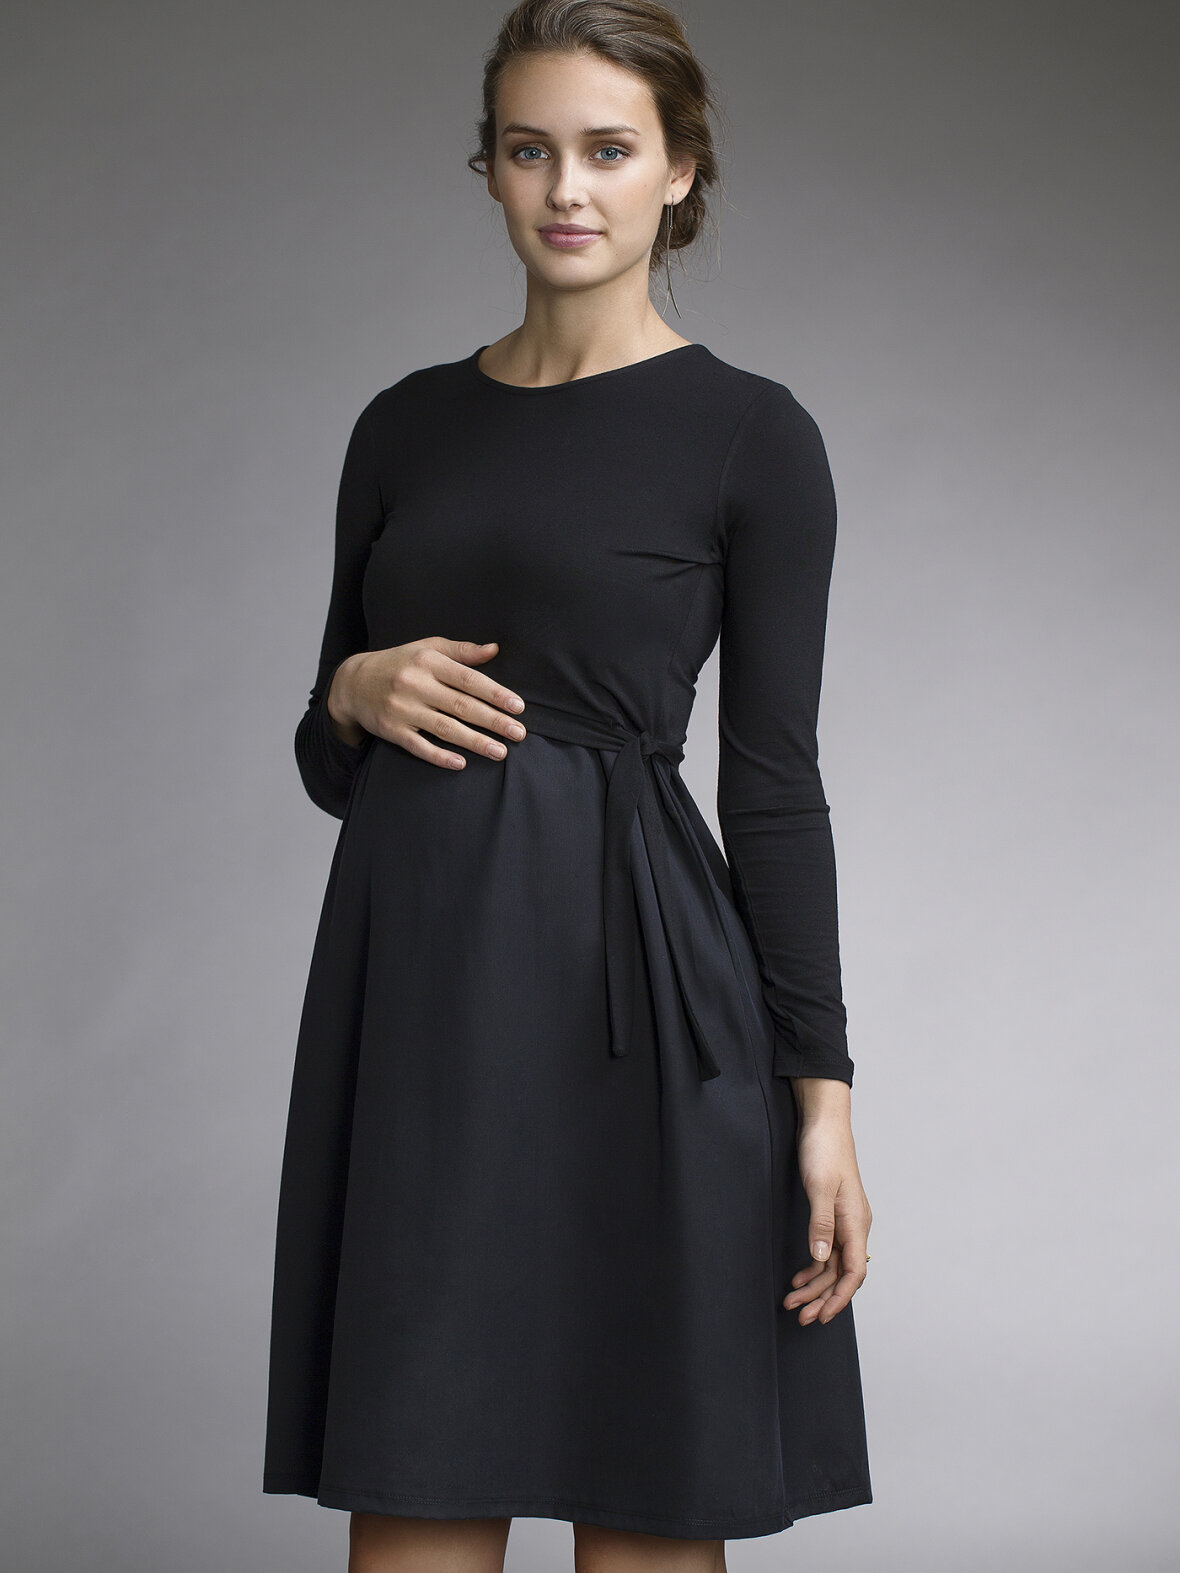 a4ac013c7955 Enula9 - Gravid kjoler - Boob - Dress 50 50 - Ammekjole